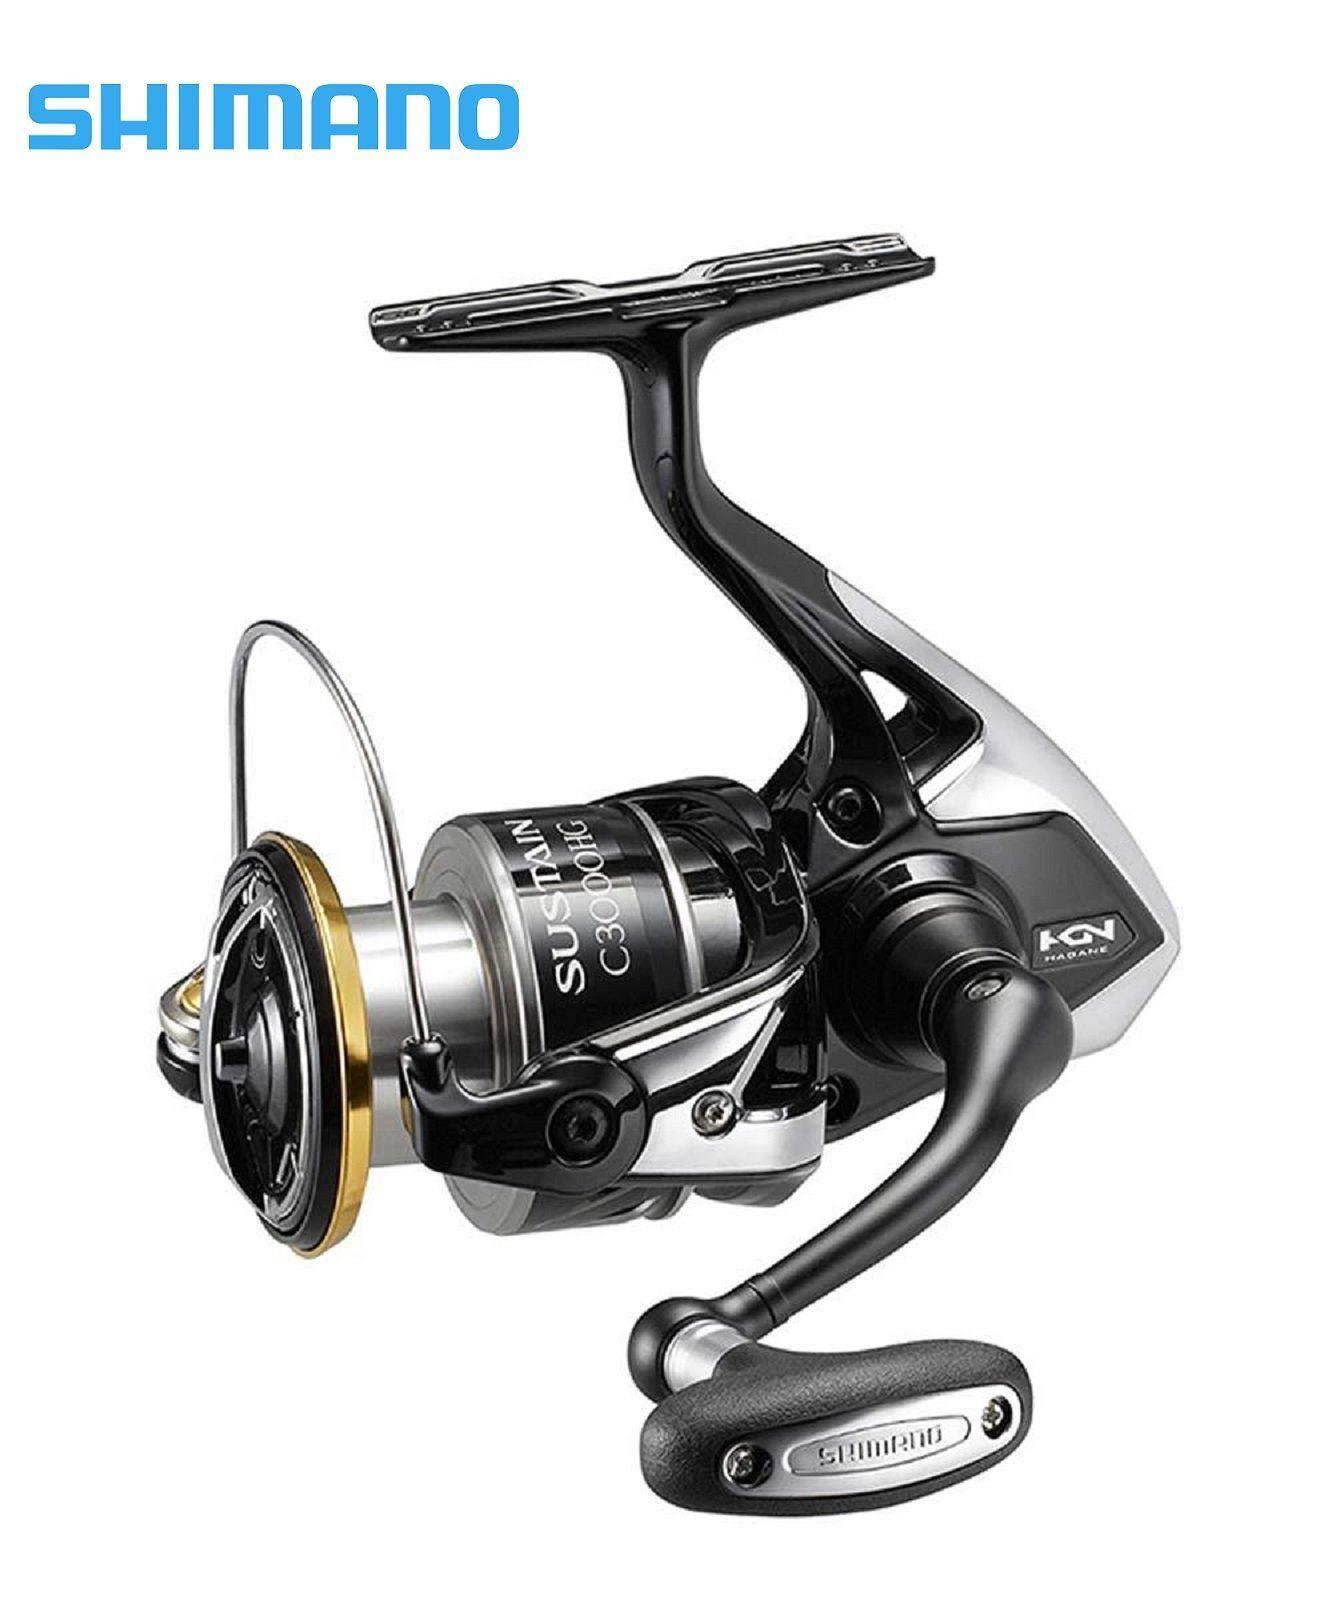 Shimano Sostener Fi Pesca Spinning 2500-5000 Arrastre Delante Carrete 2500-5000 Spinning 2bdfc8